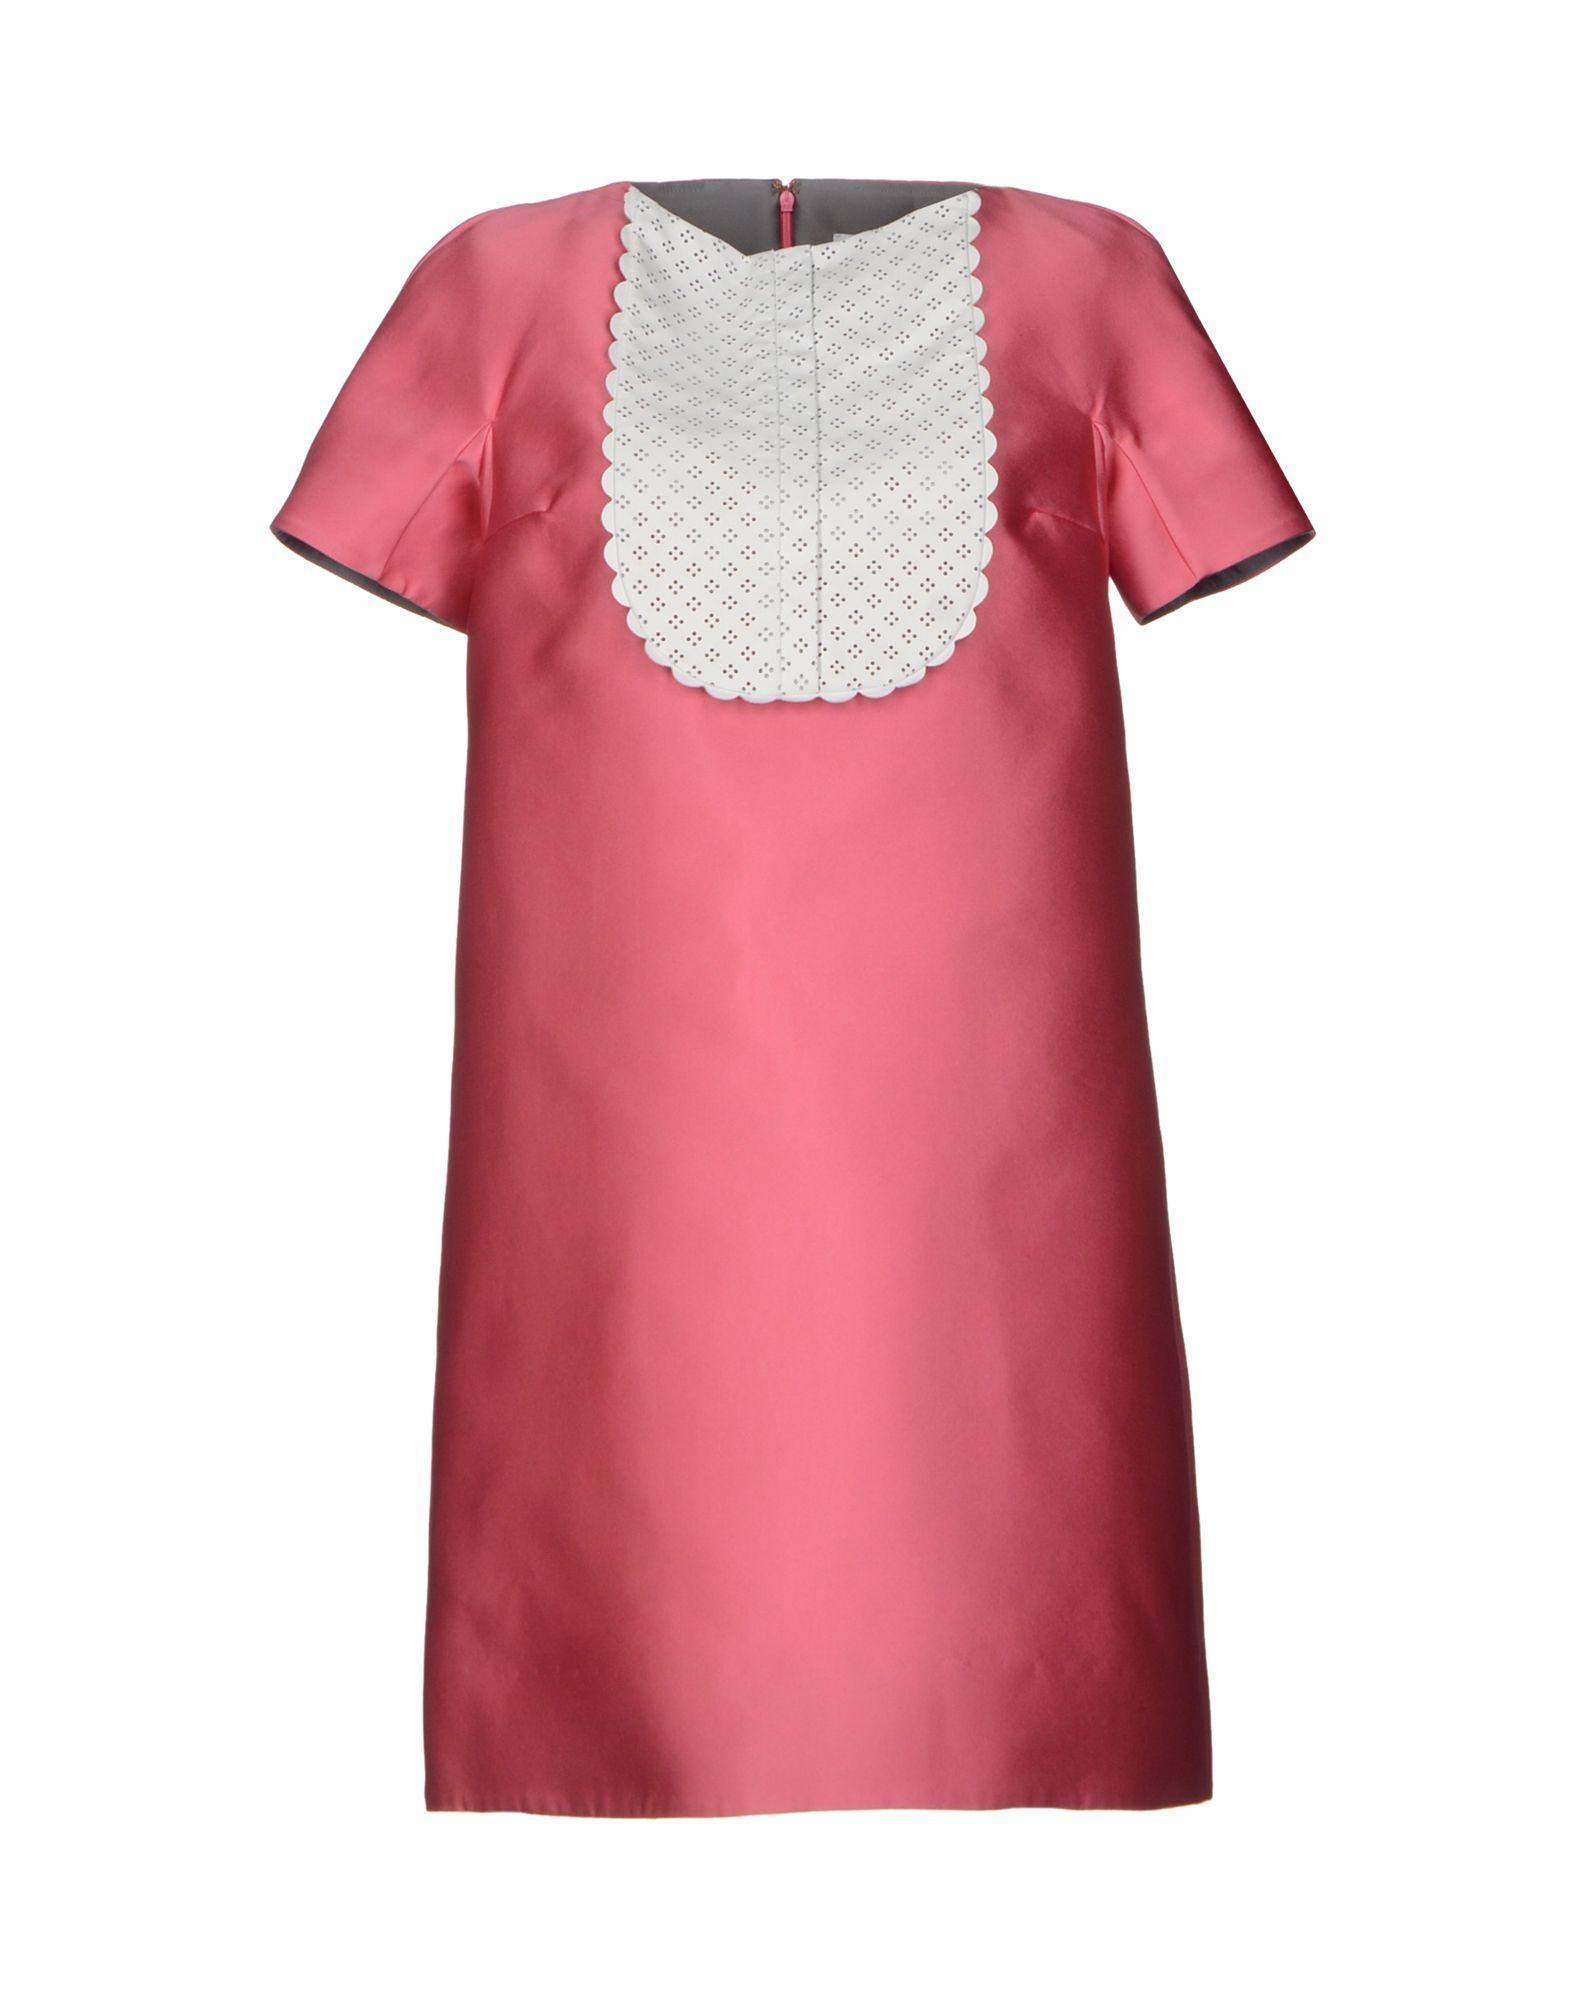 Viktor u rolf short dress women viktor u rolf short dresses online